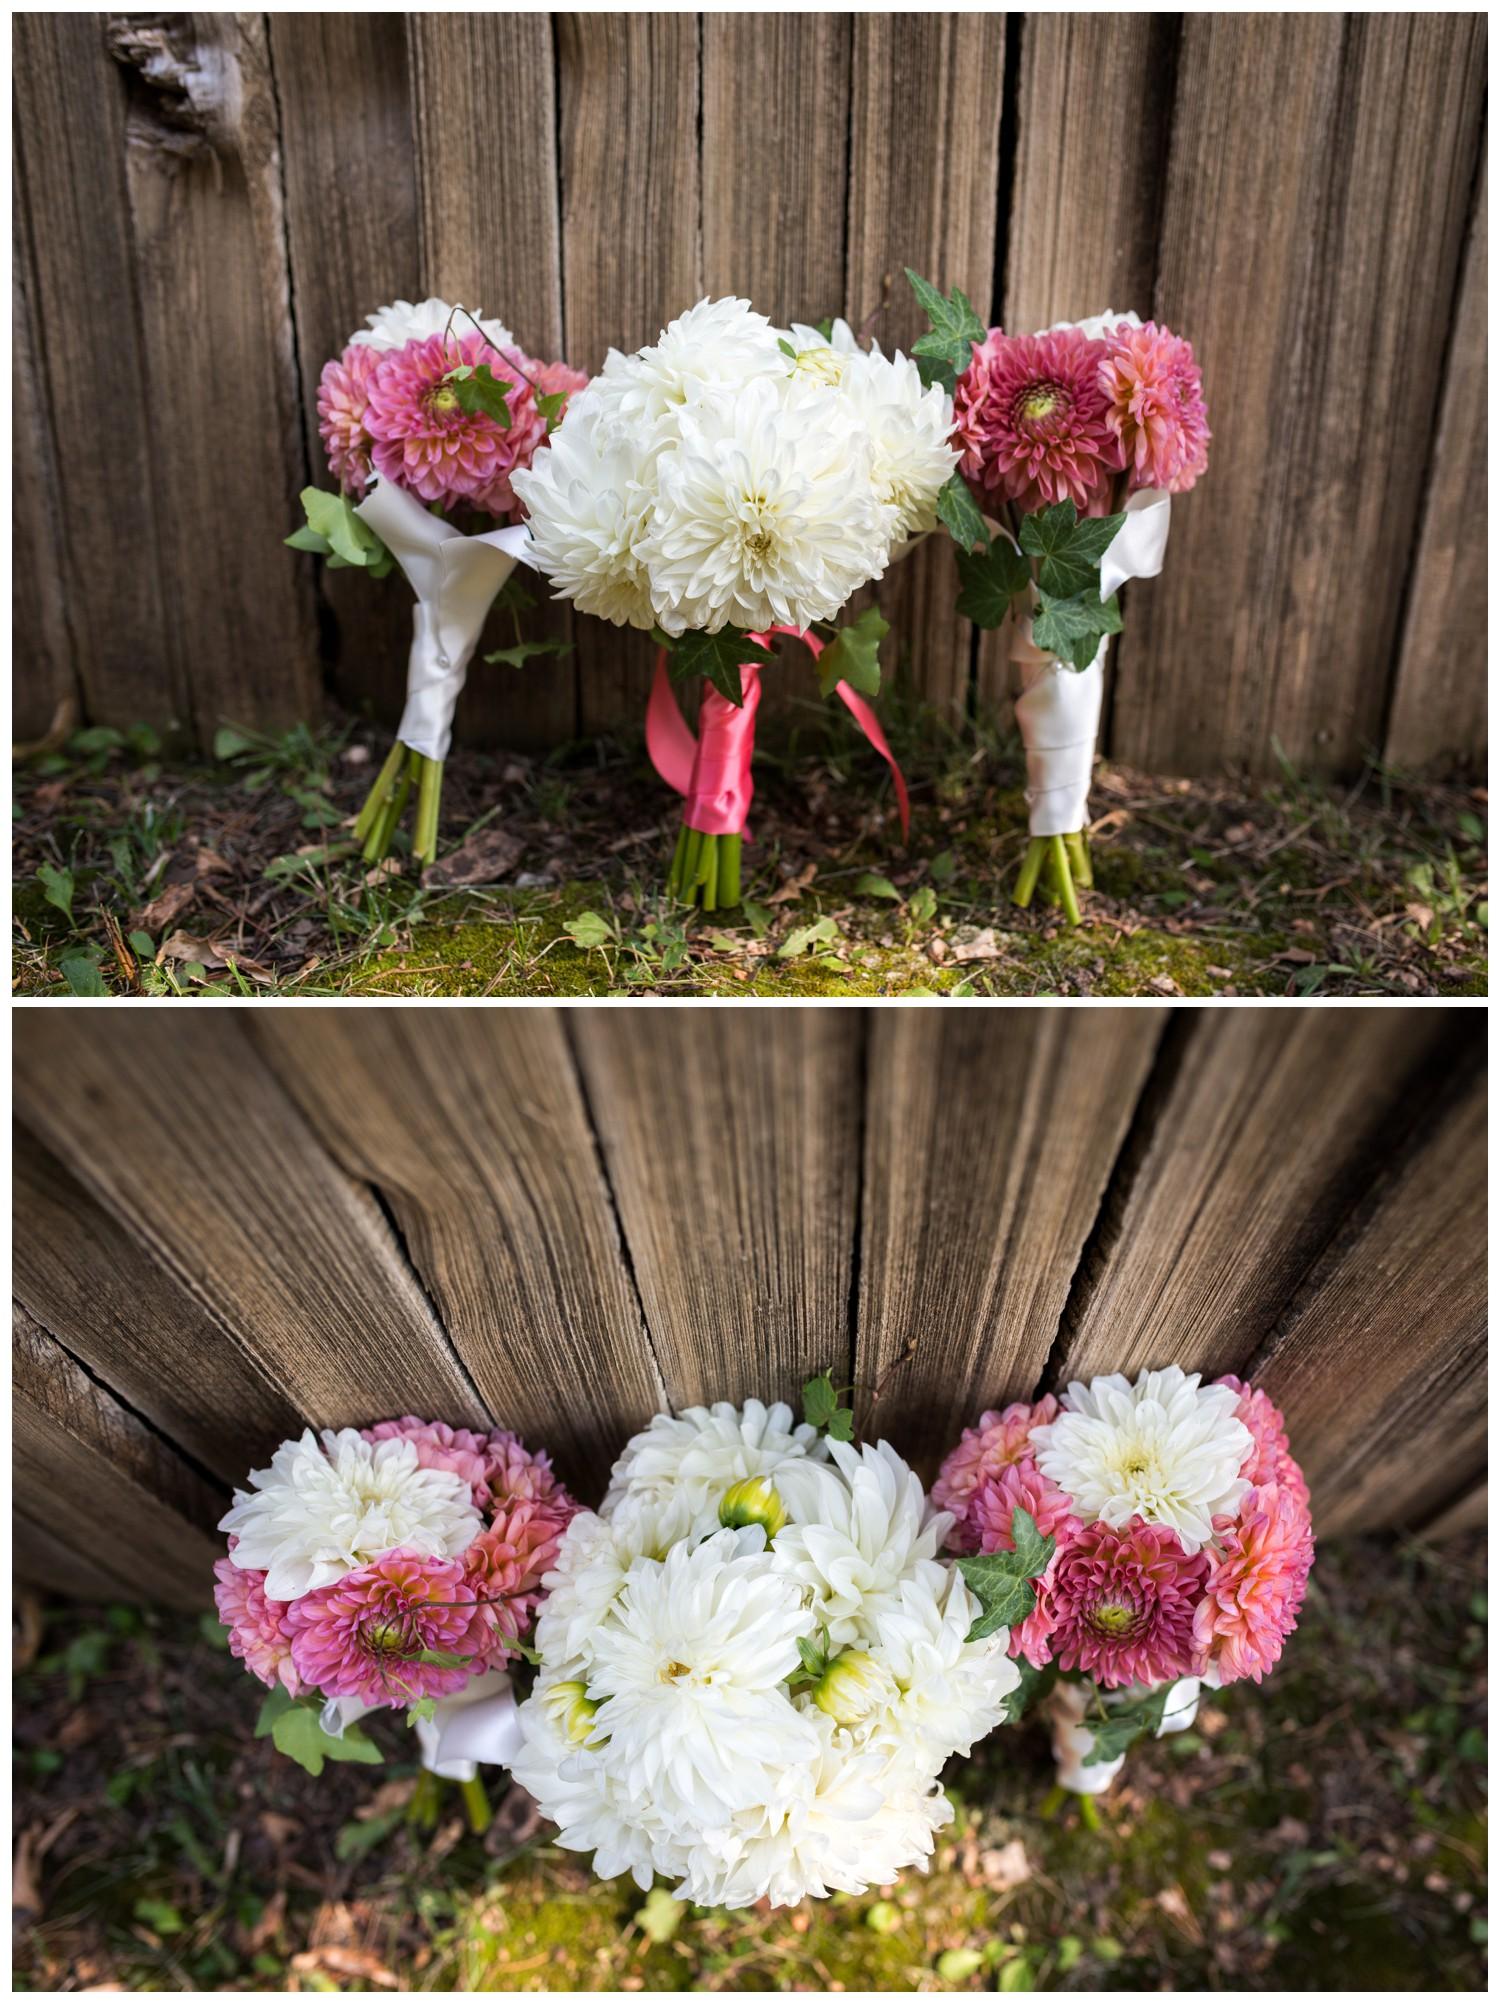 evergreen-colorado-wedding-photographer_0018.jpg